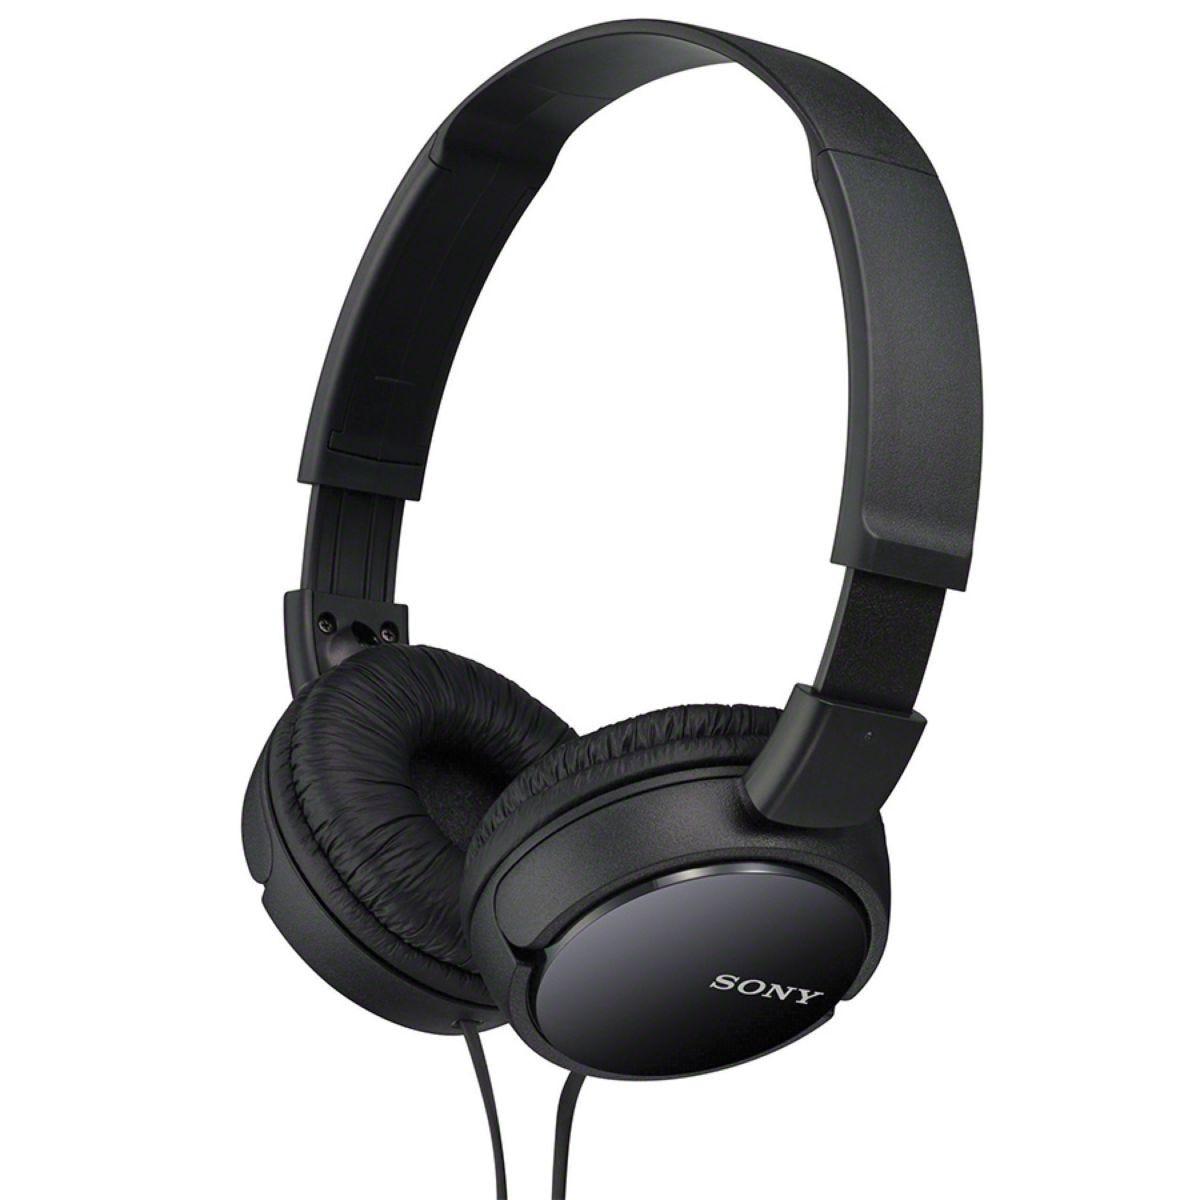 Sony ZX110 Series Foldable Stereo Headphones - Black